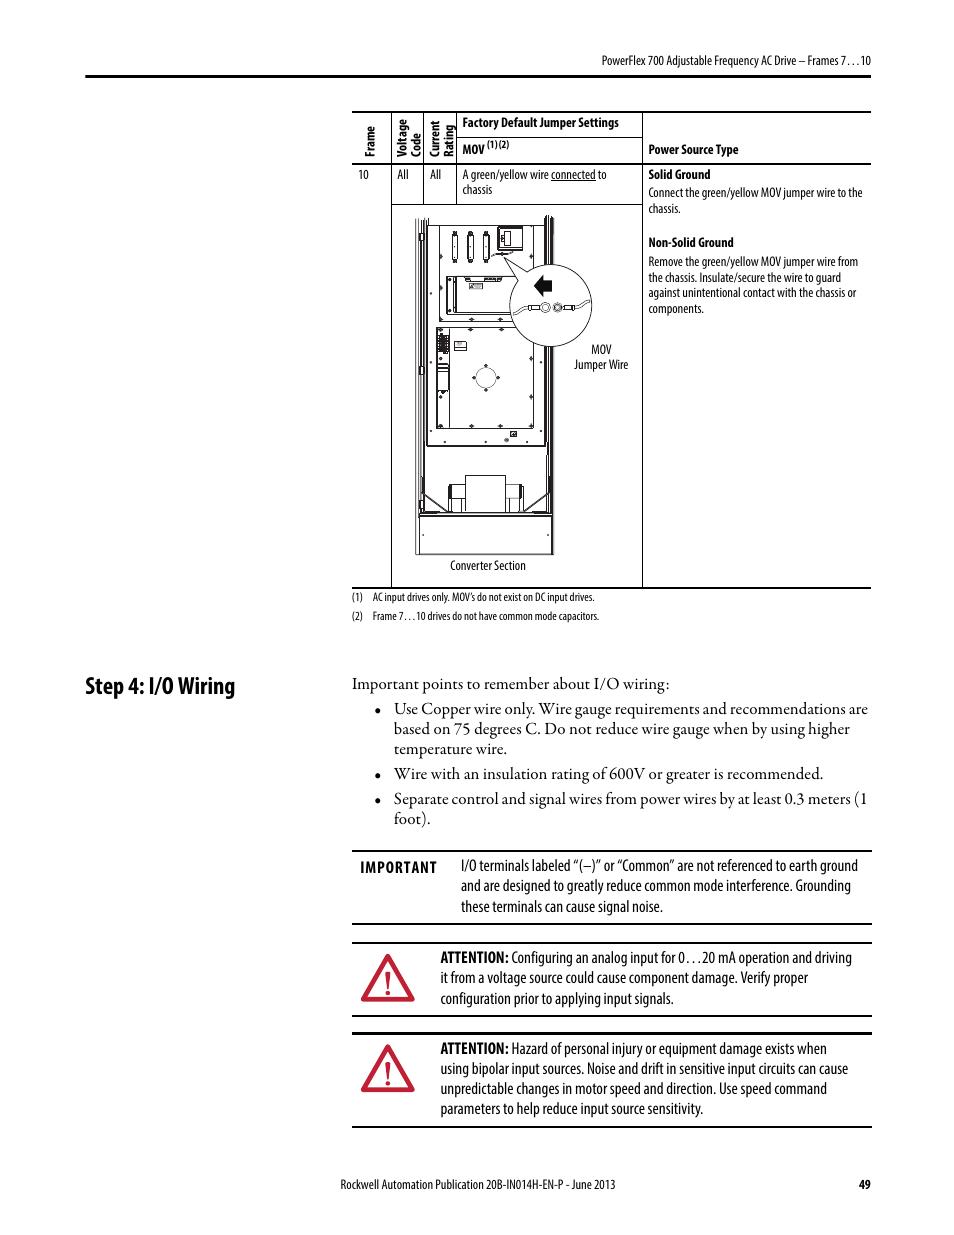 powerflex 700 frame 6 wiring diagram diagram base website wiring diagram -  brainlobesdiagram.matteotrentin.it  diagram base website full edition - matteotrentin